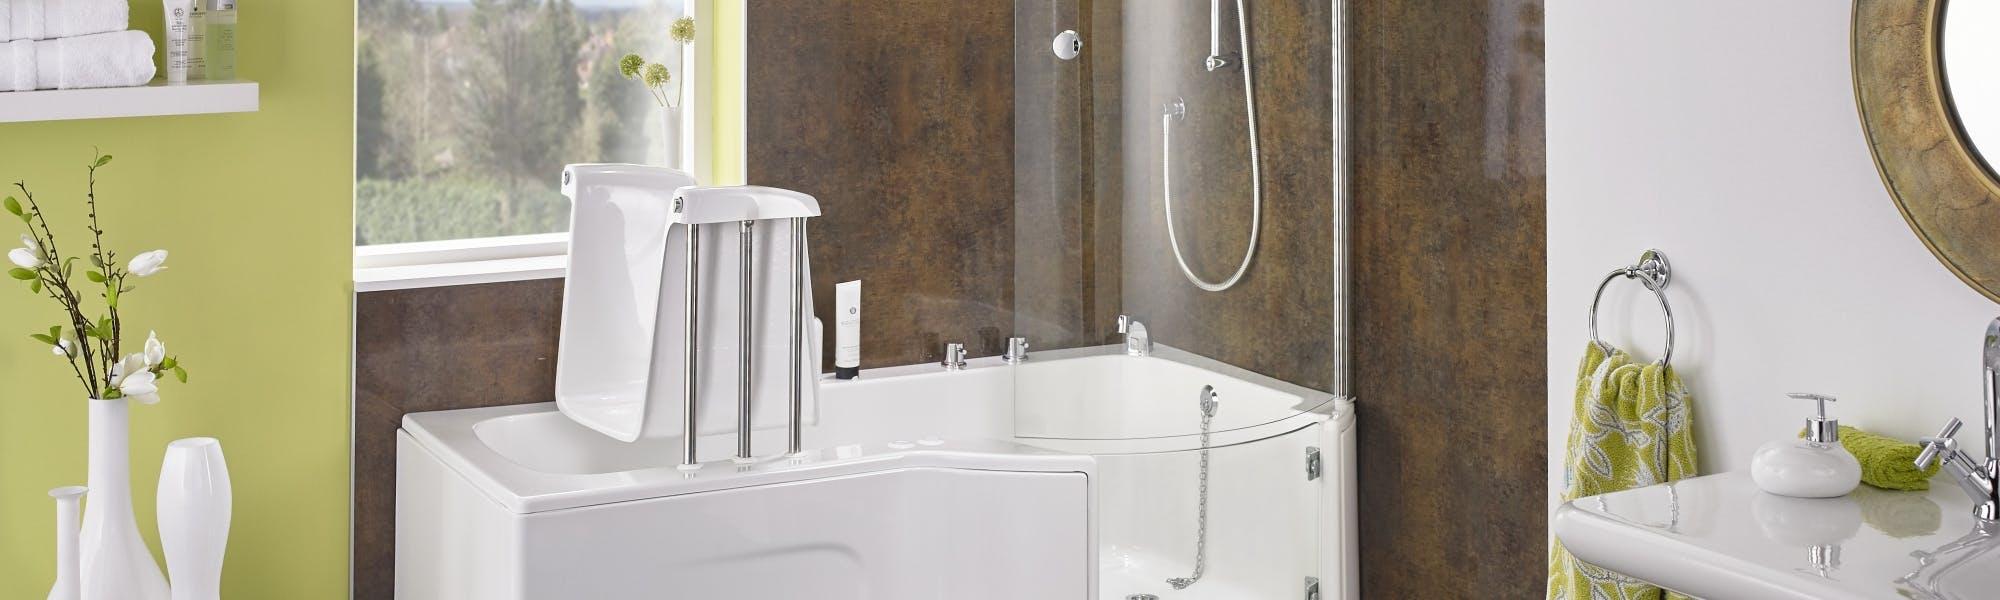 easy access bathroom - design & fit